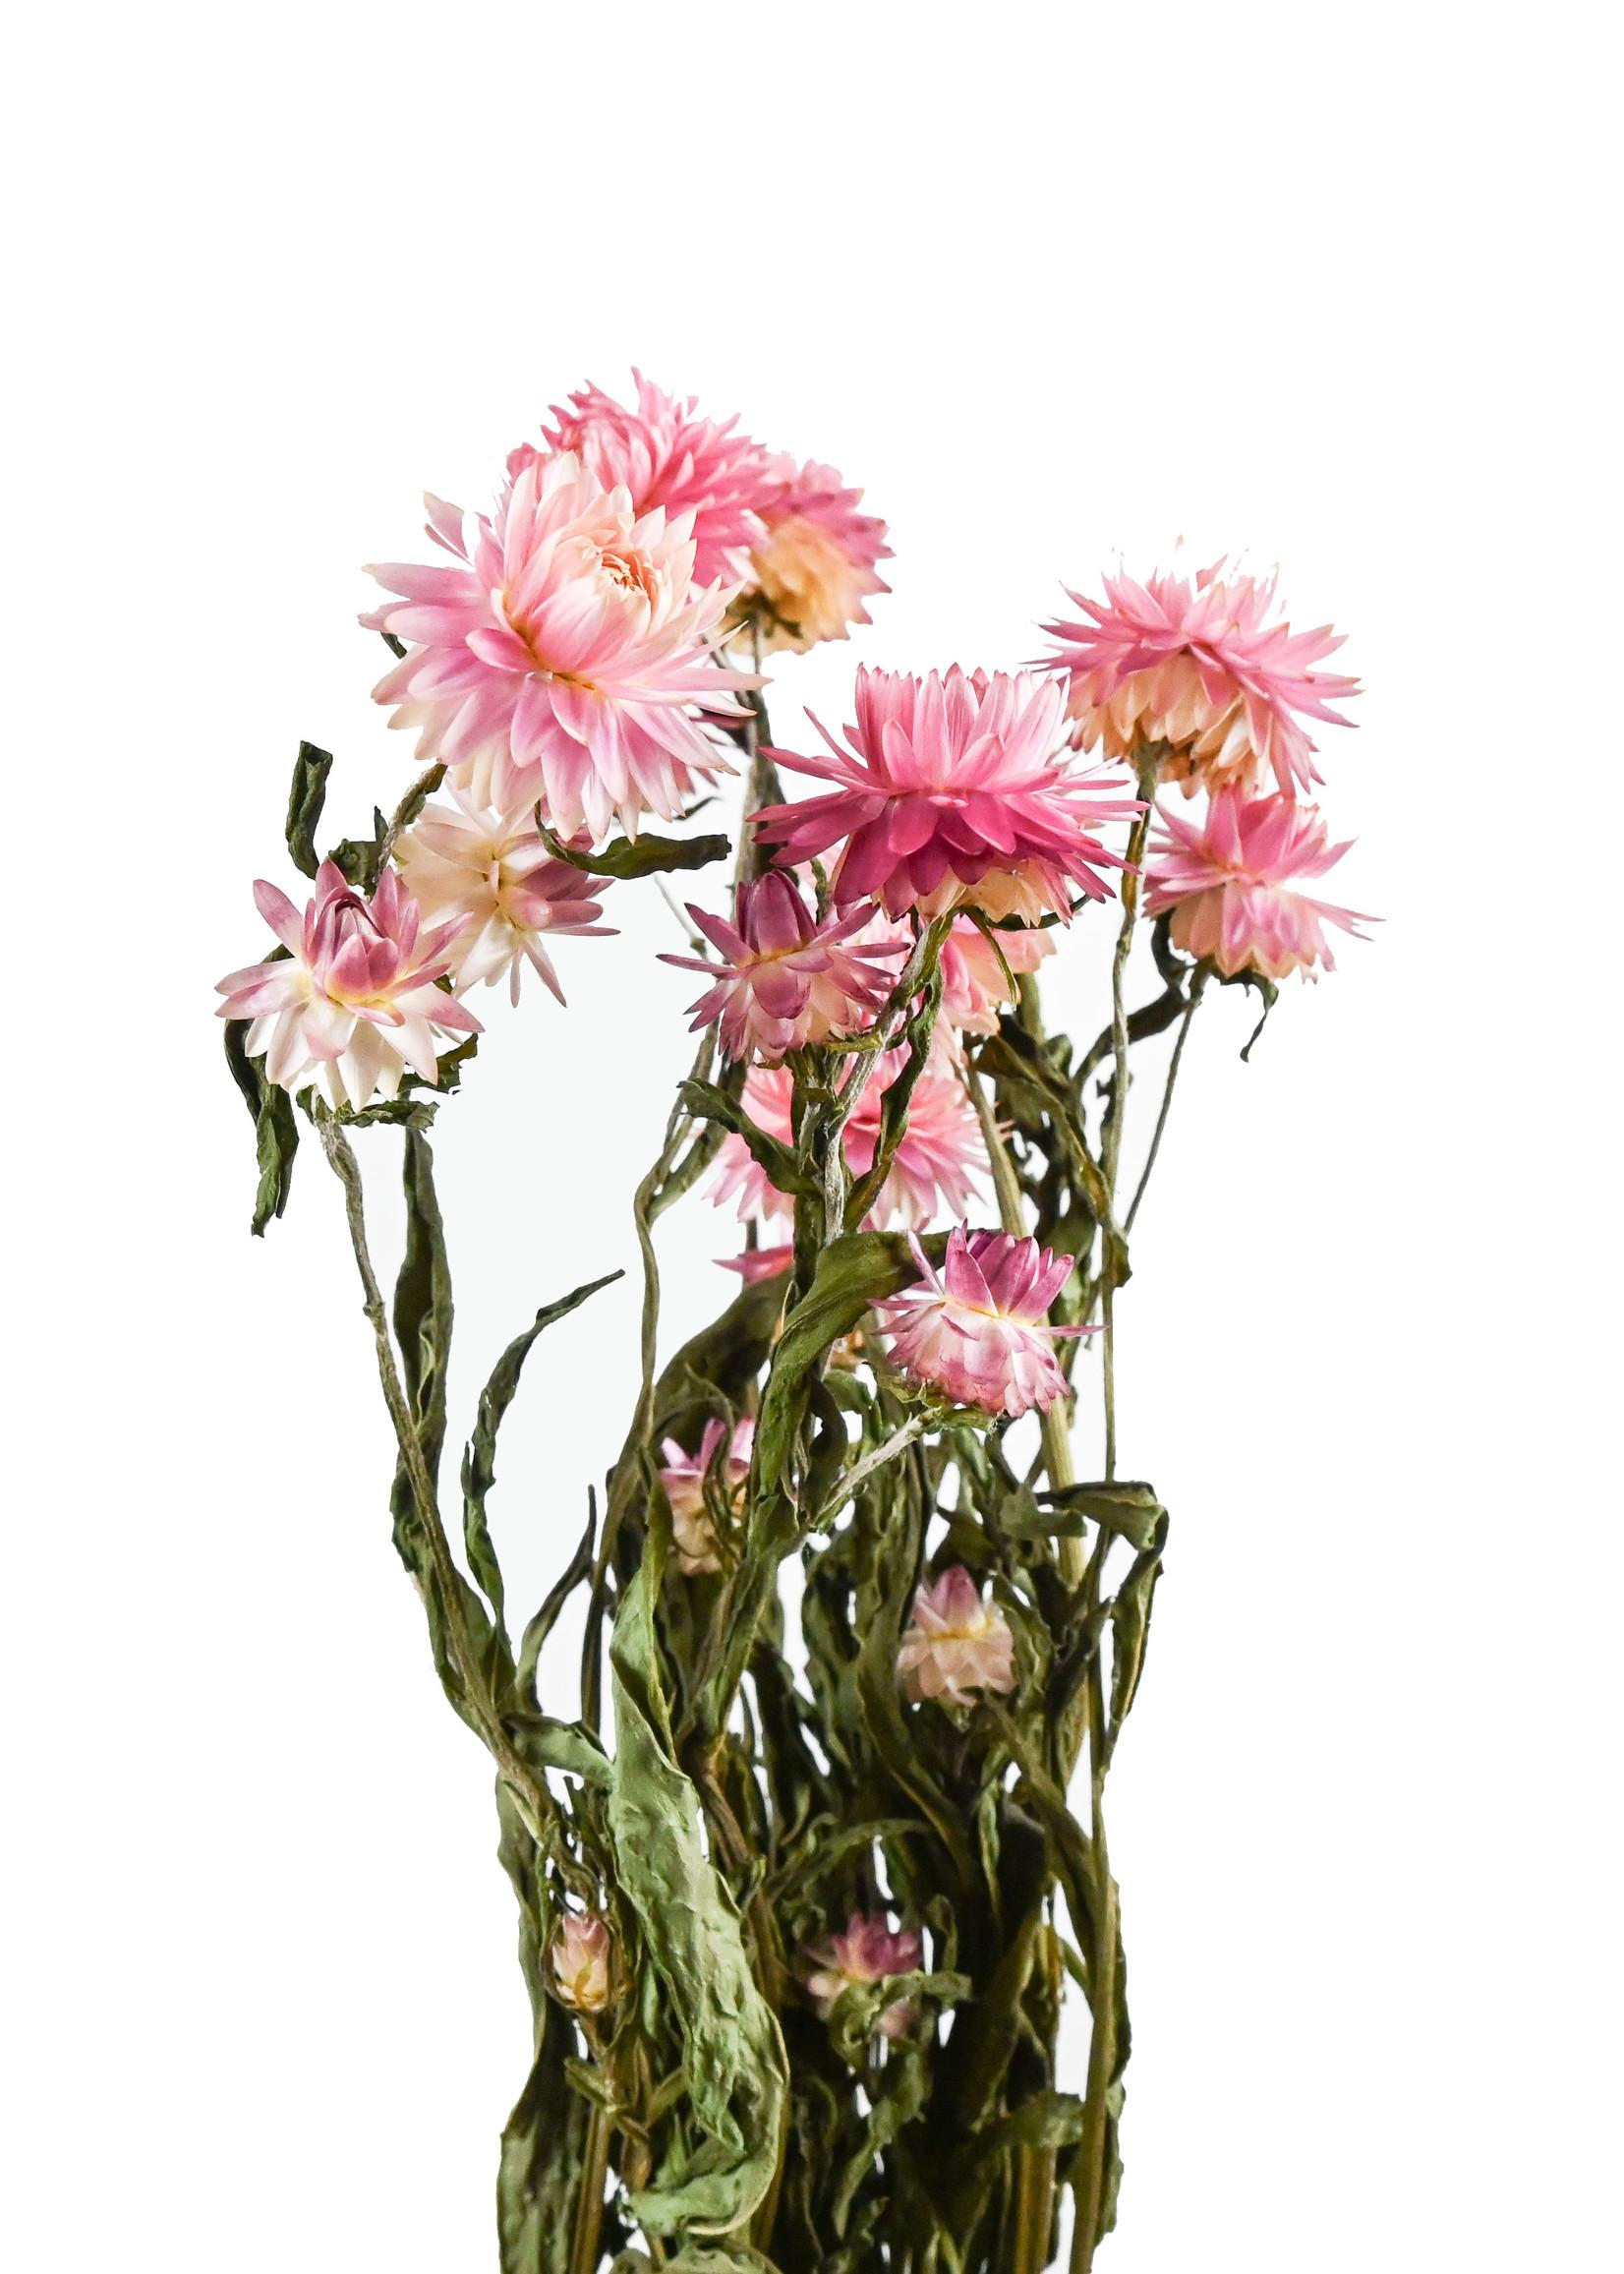 Dry flower acroclinium pink